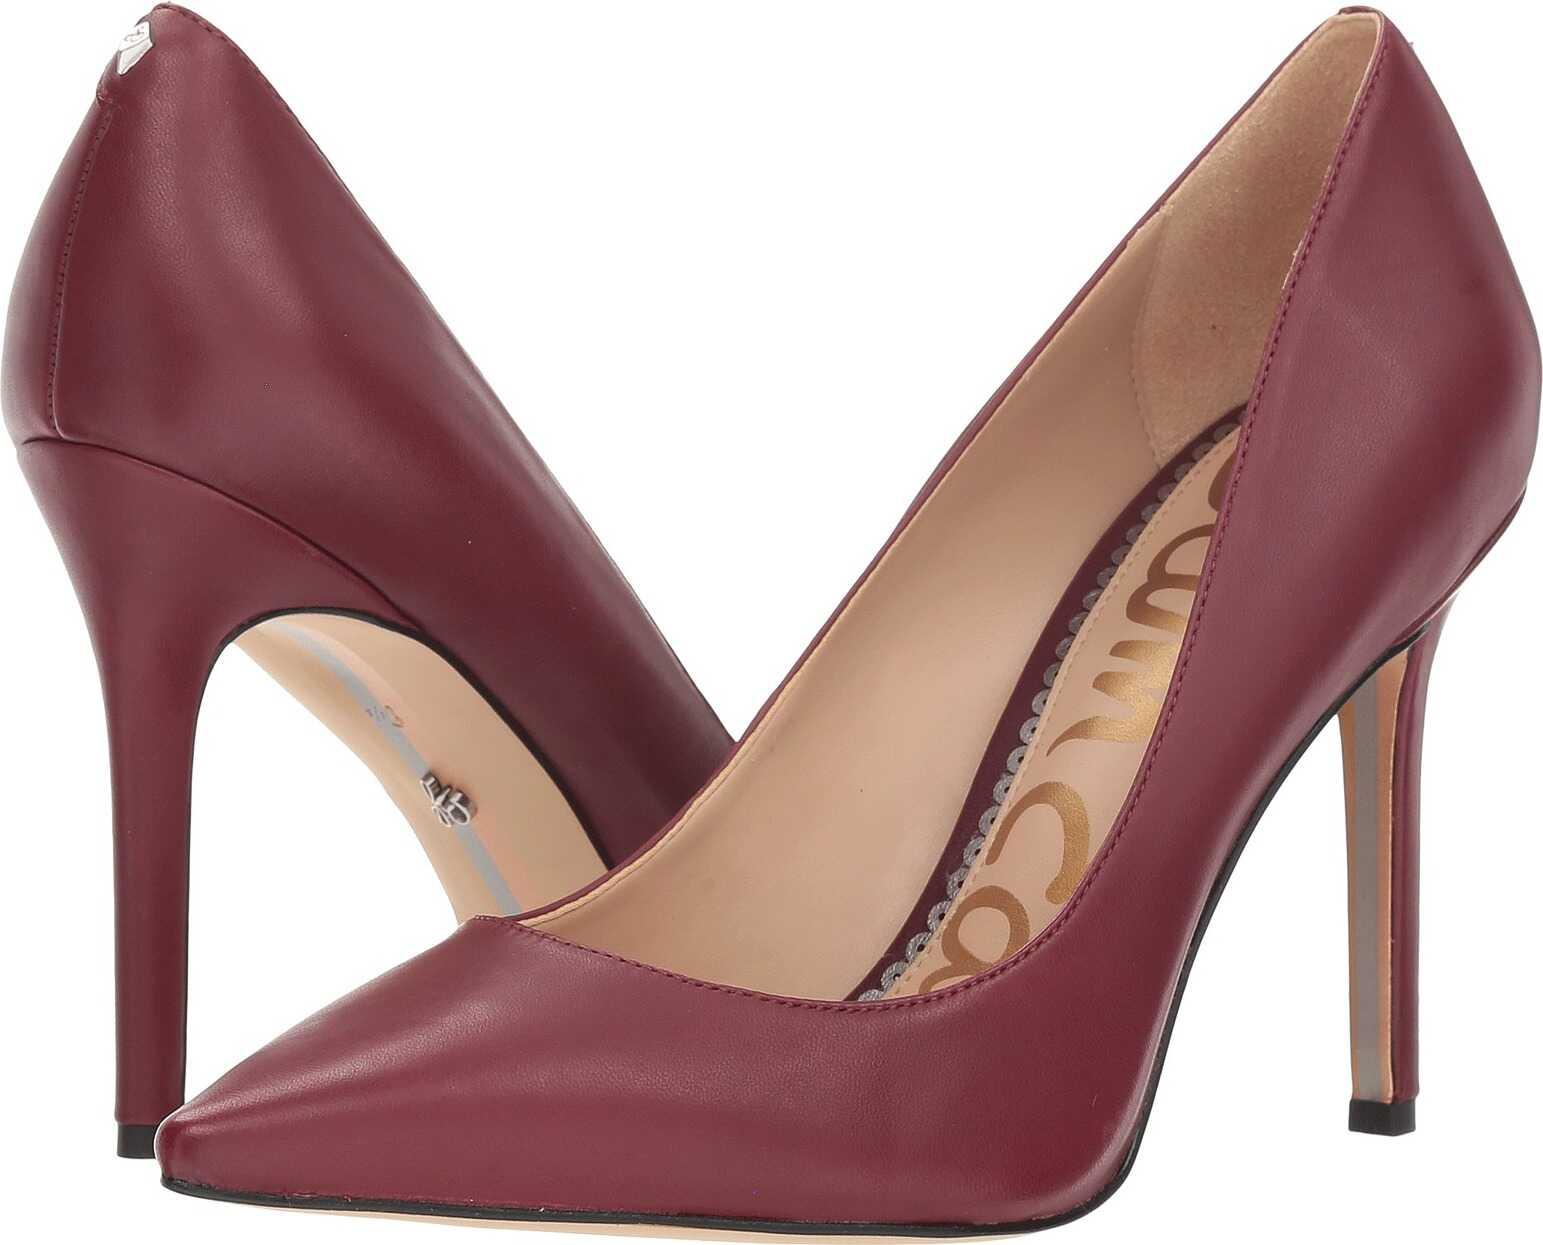 Sam Edelman Hazel Beet Red Dress Nappa Leather